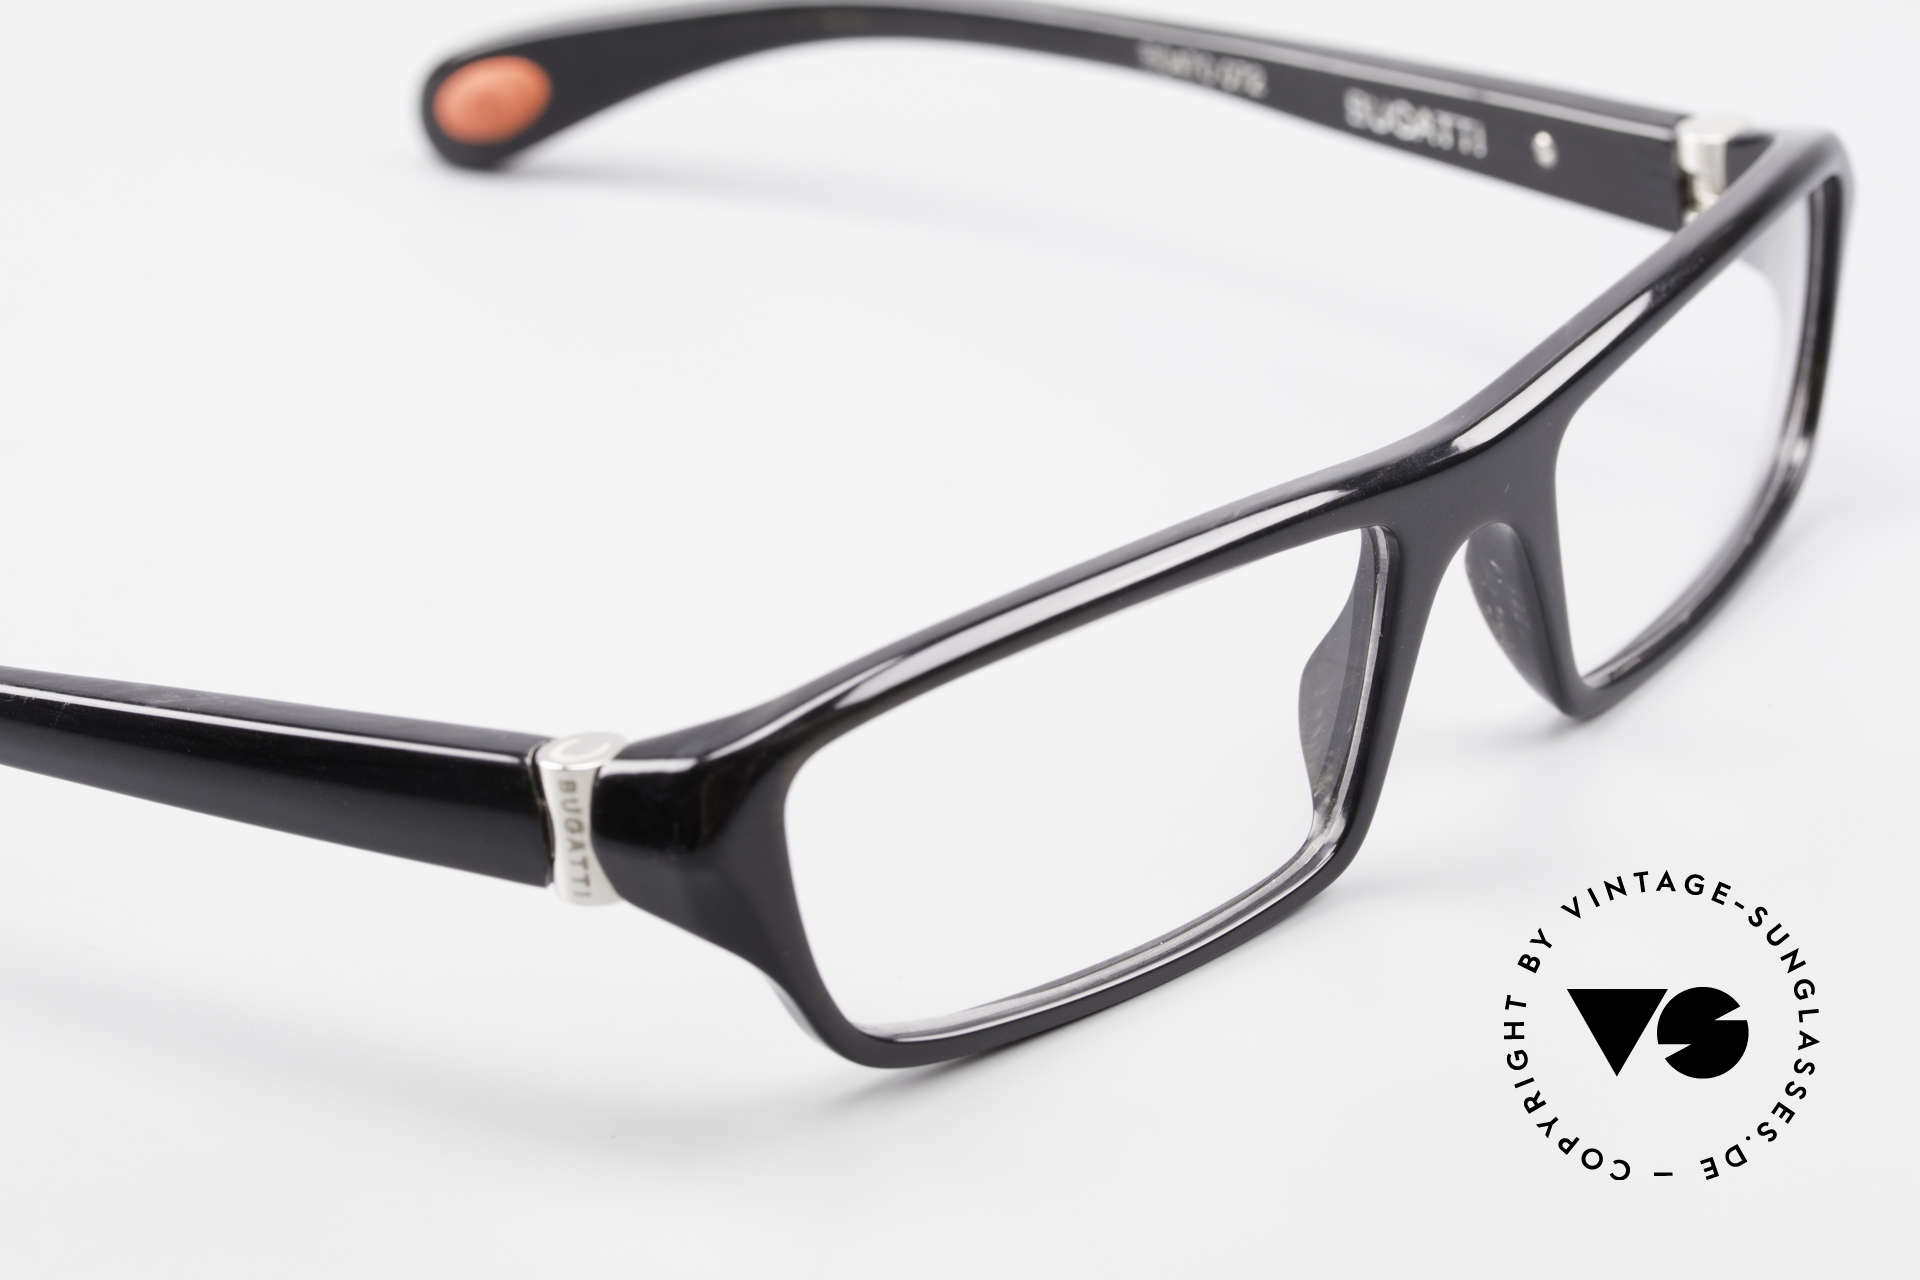 Bugatti 470 Limited Luxury Eyeglasses Men, unworn model comes with orig. case & packing, Made for Men